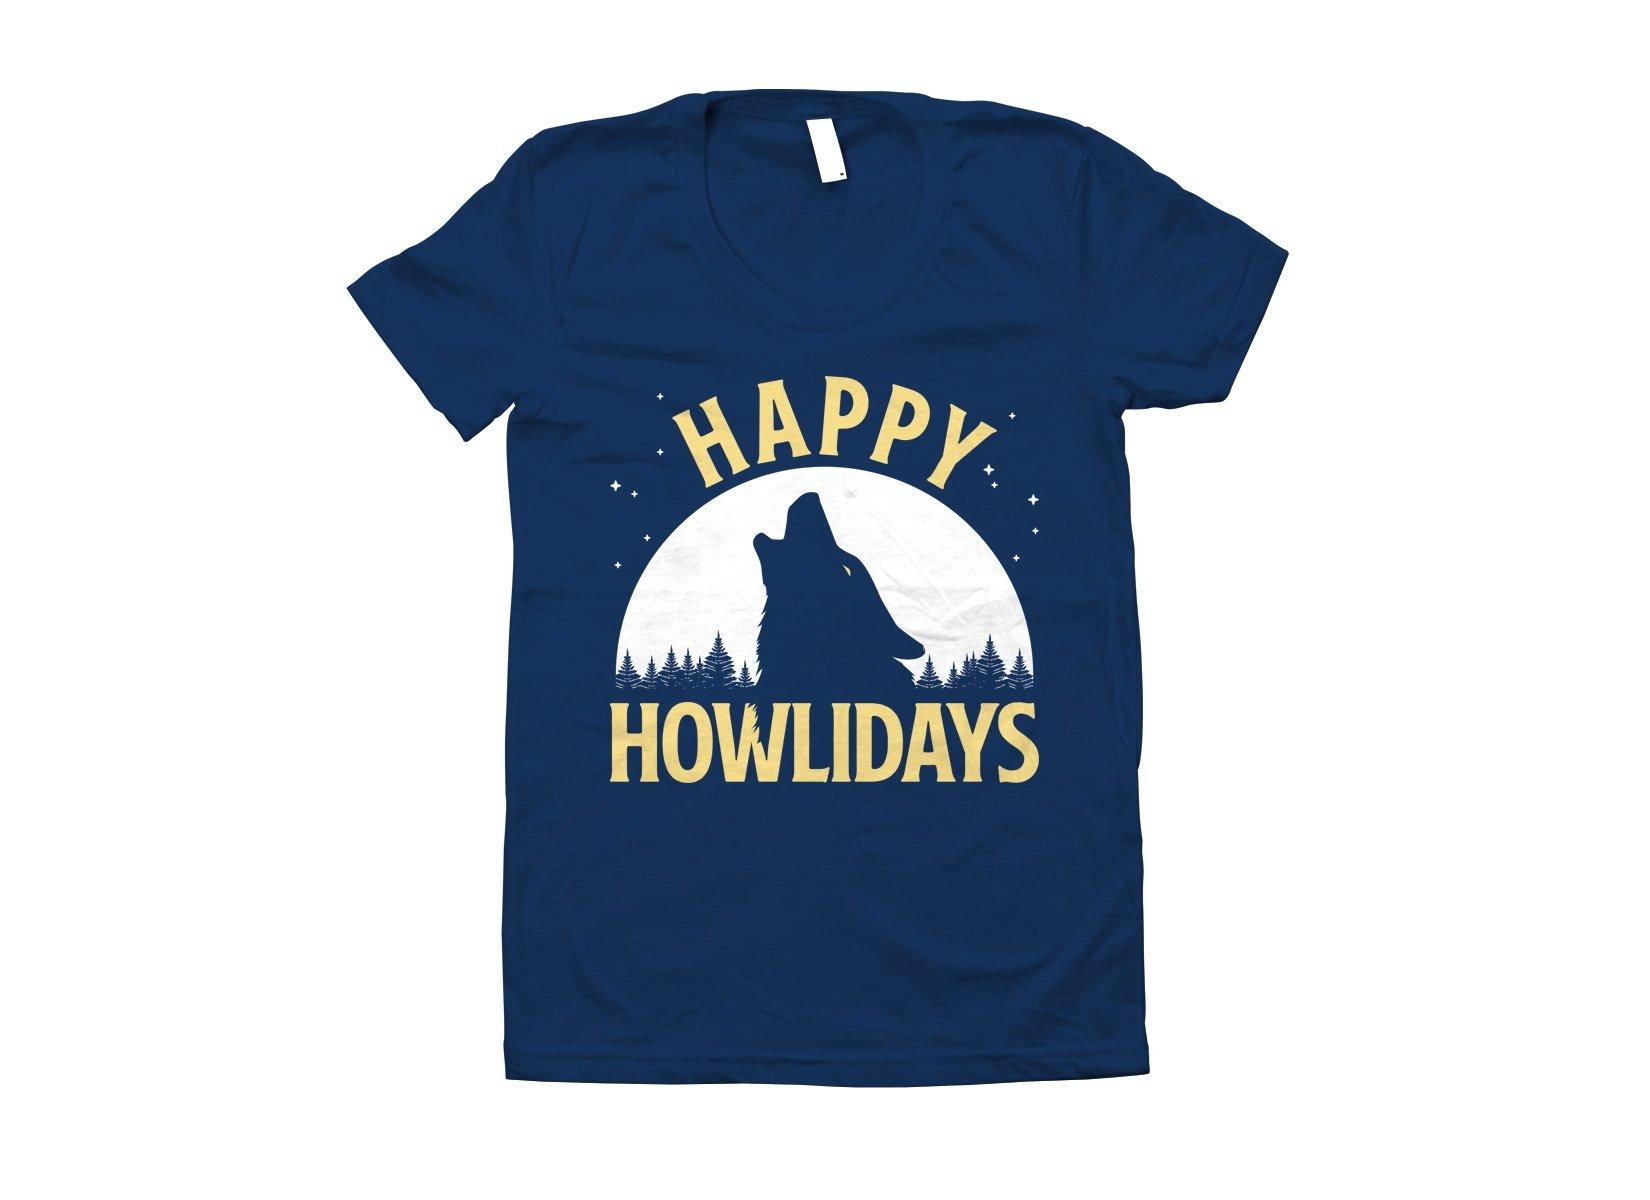 Happy Howlidays on Juniors T-Shirt